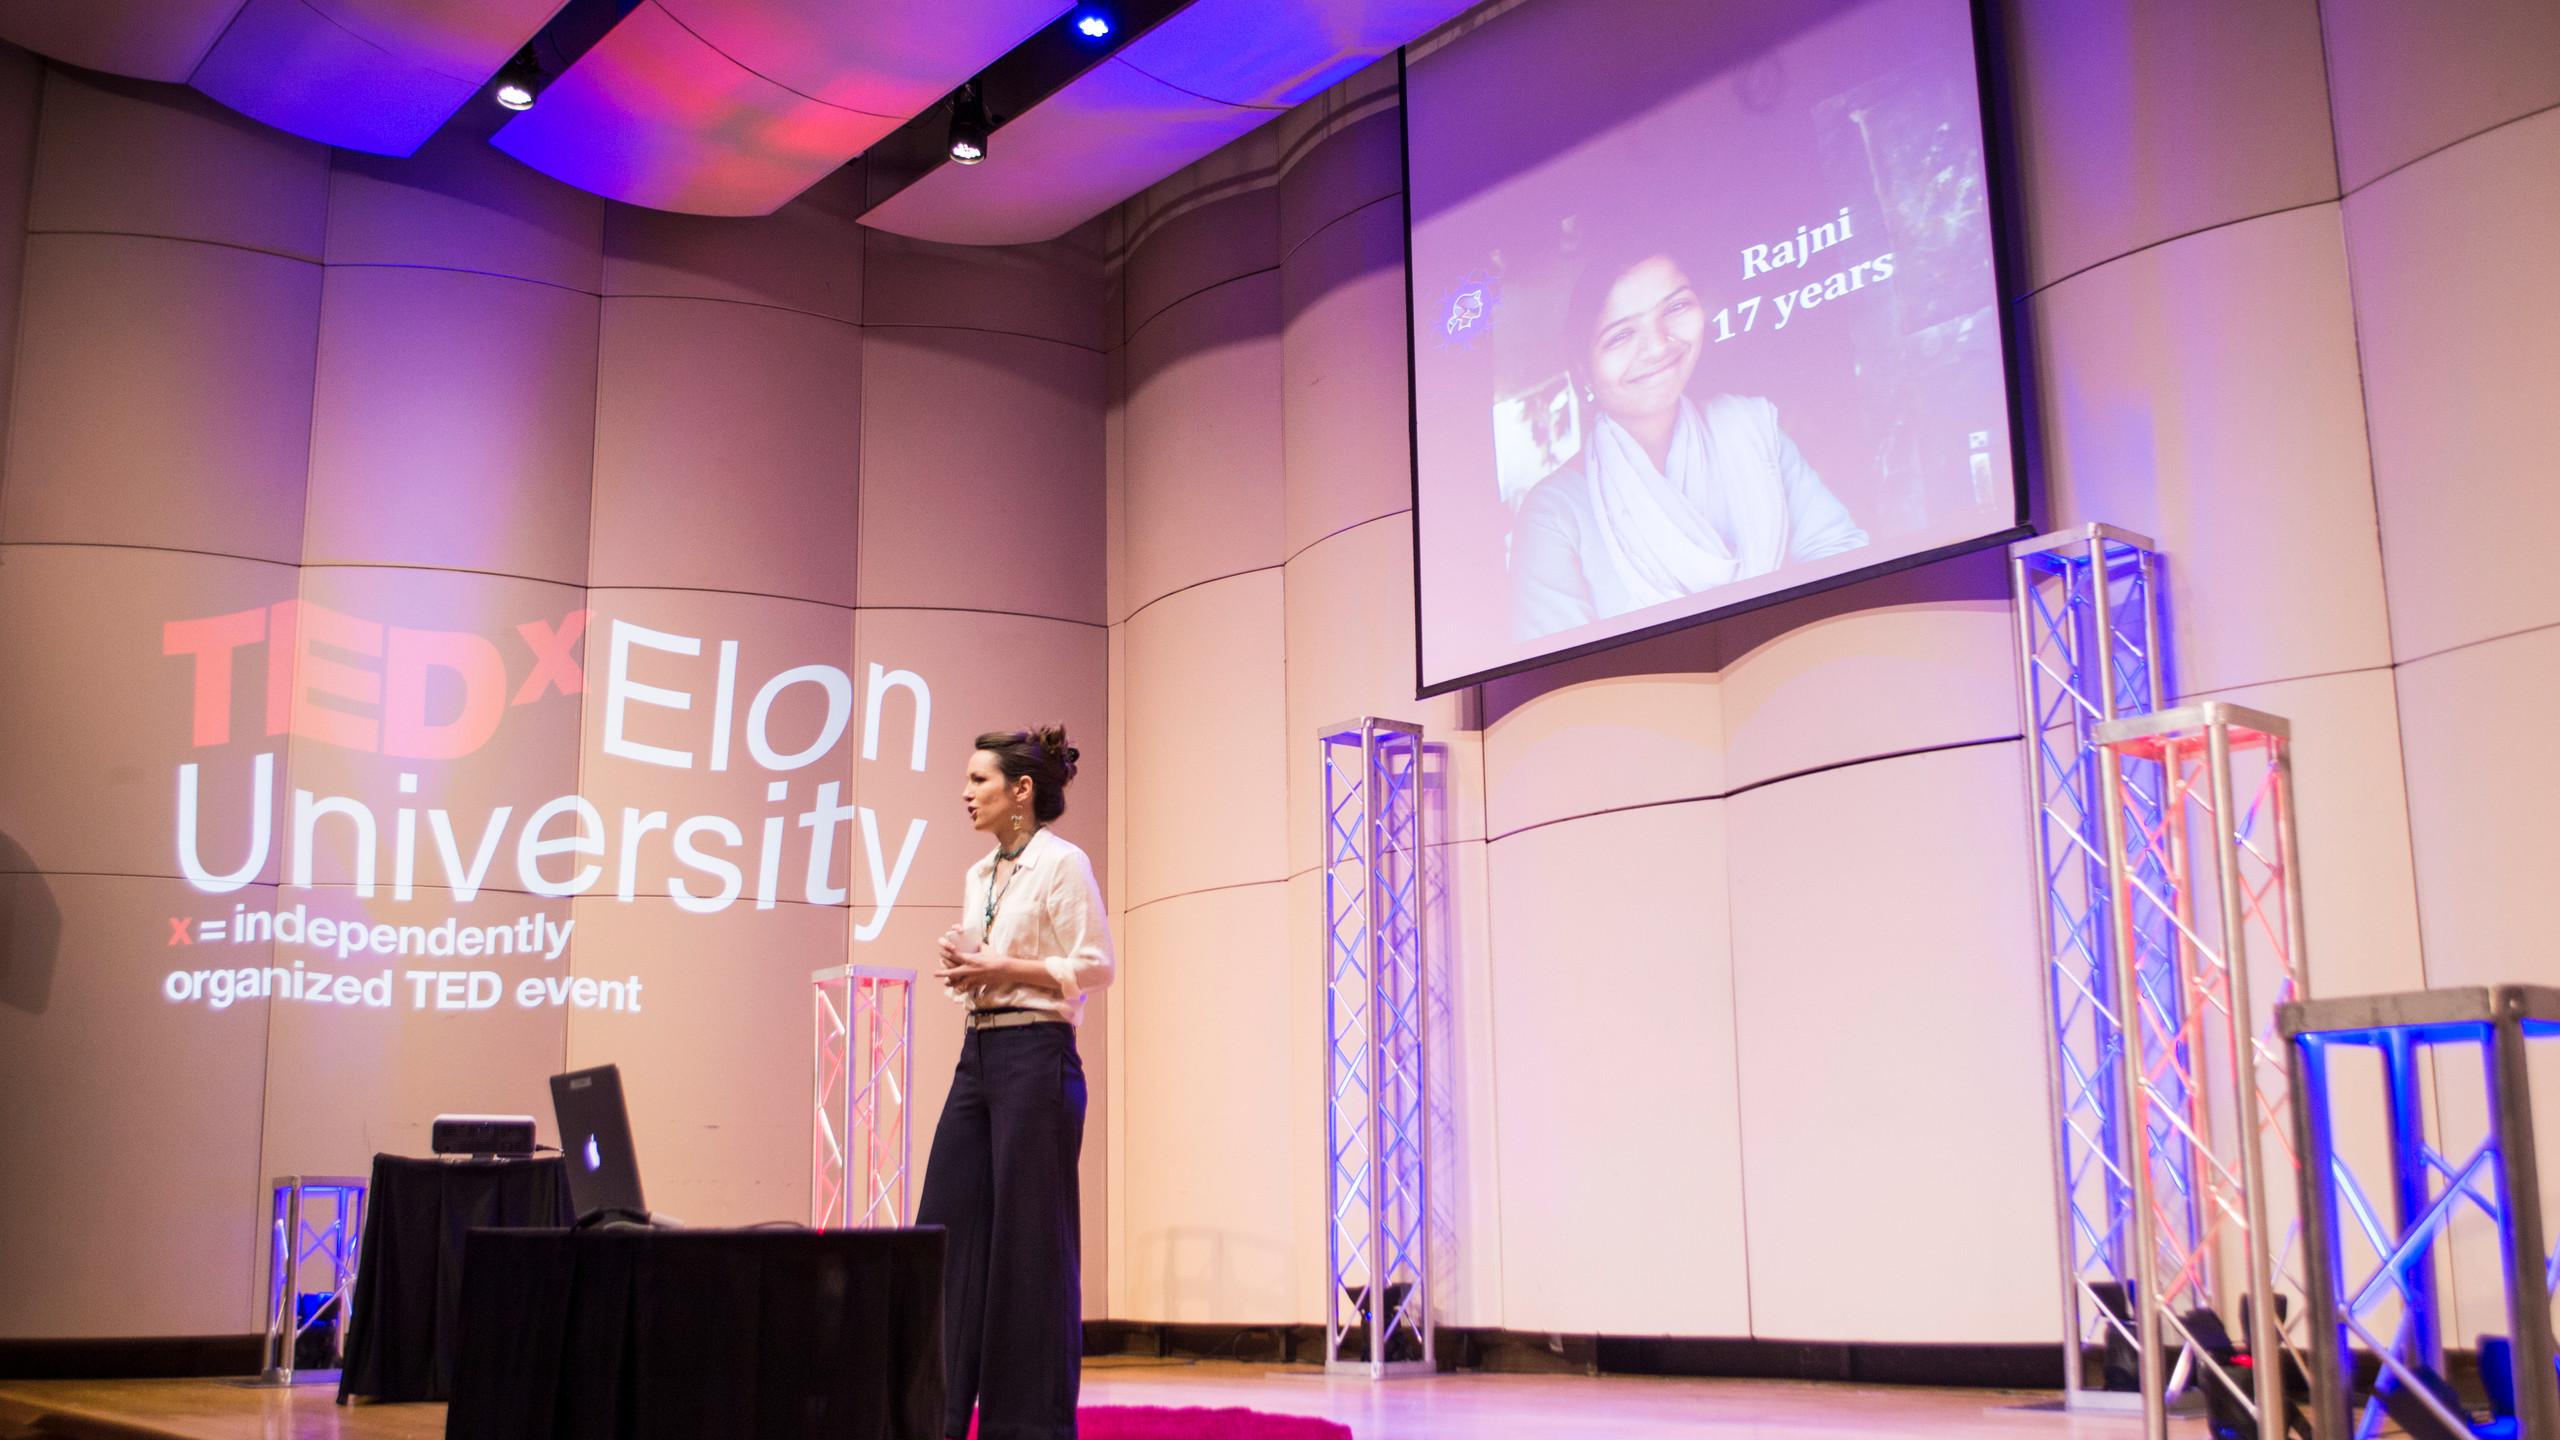 Alyssa Newlon spoke about her work empowering local female leaders in rural India.